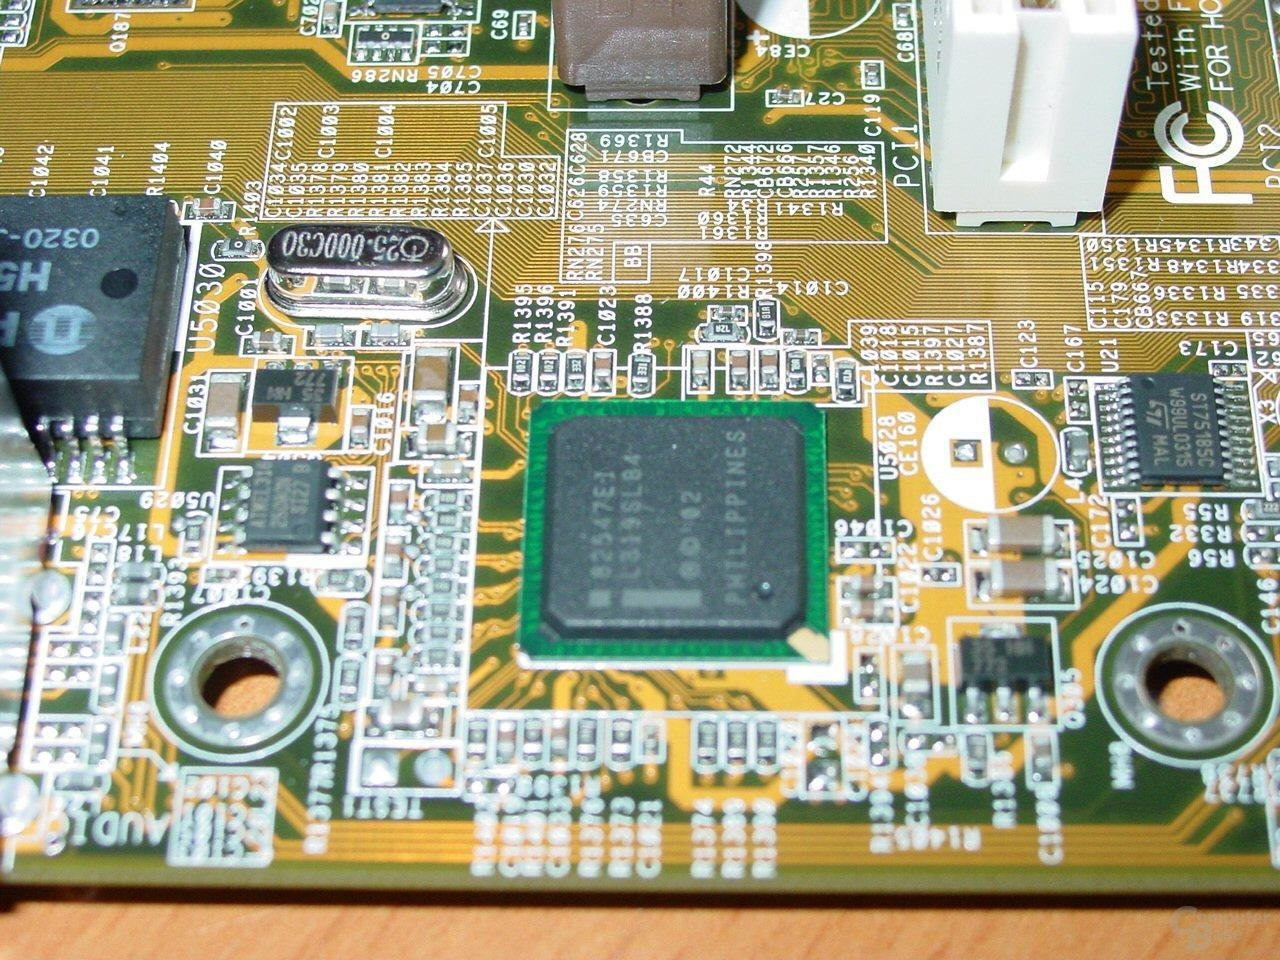 Asus P4C800-E Deluxe - Intel CSA Gigabit LAN